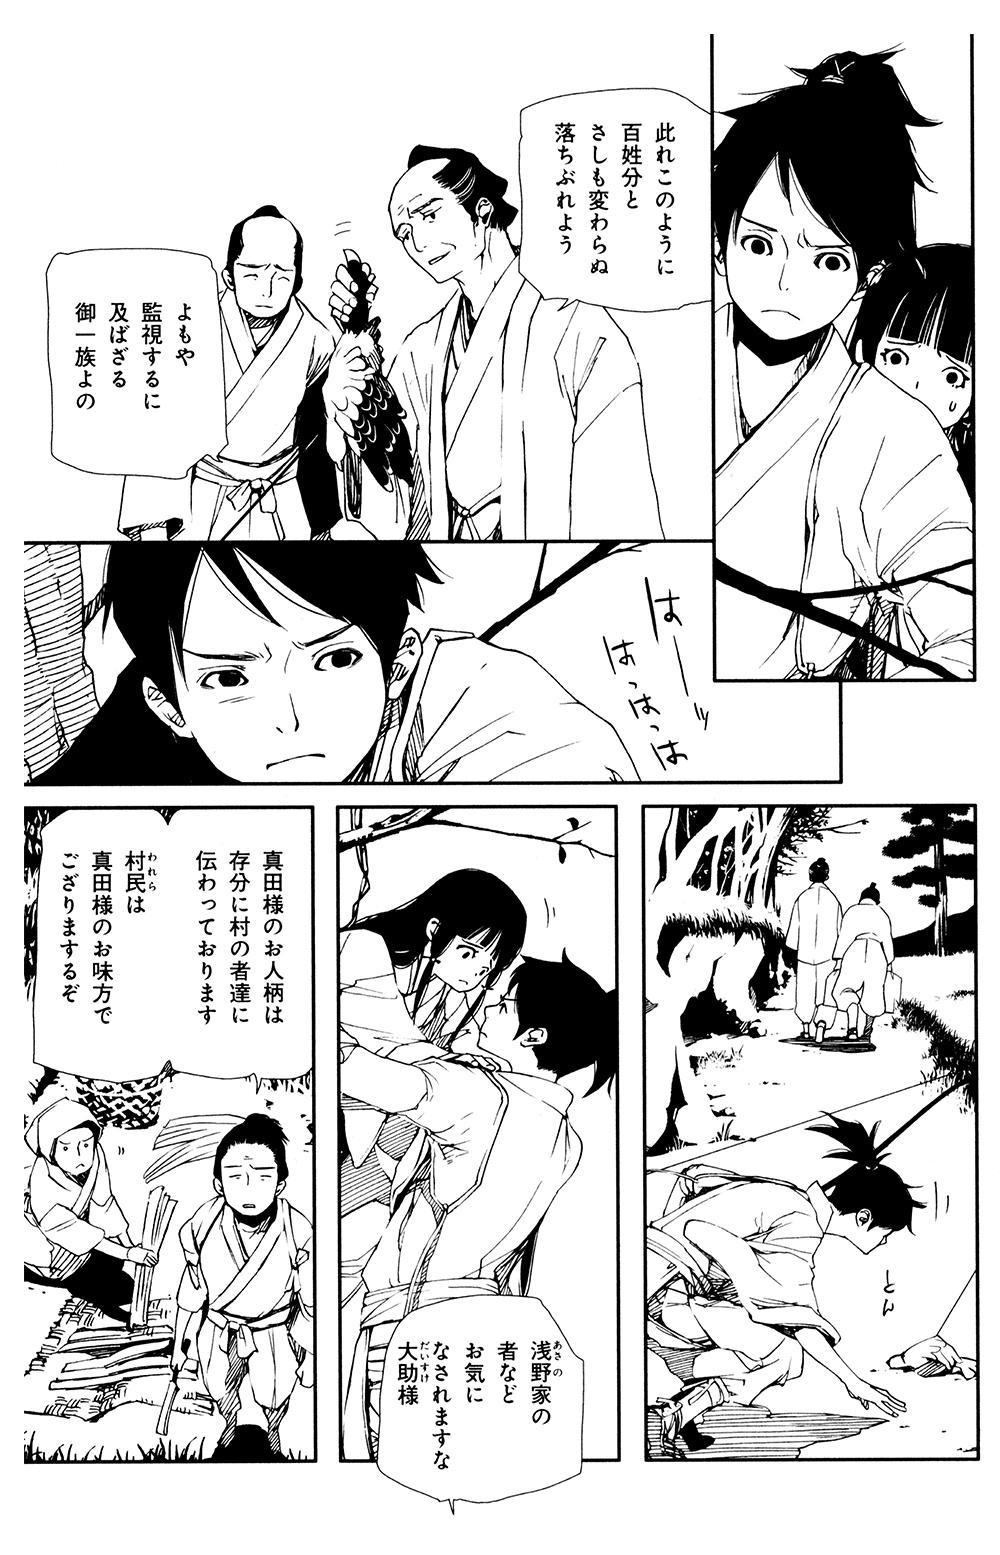 朱黒の仁 第1話①syukoku-1-11.jpg